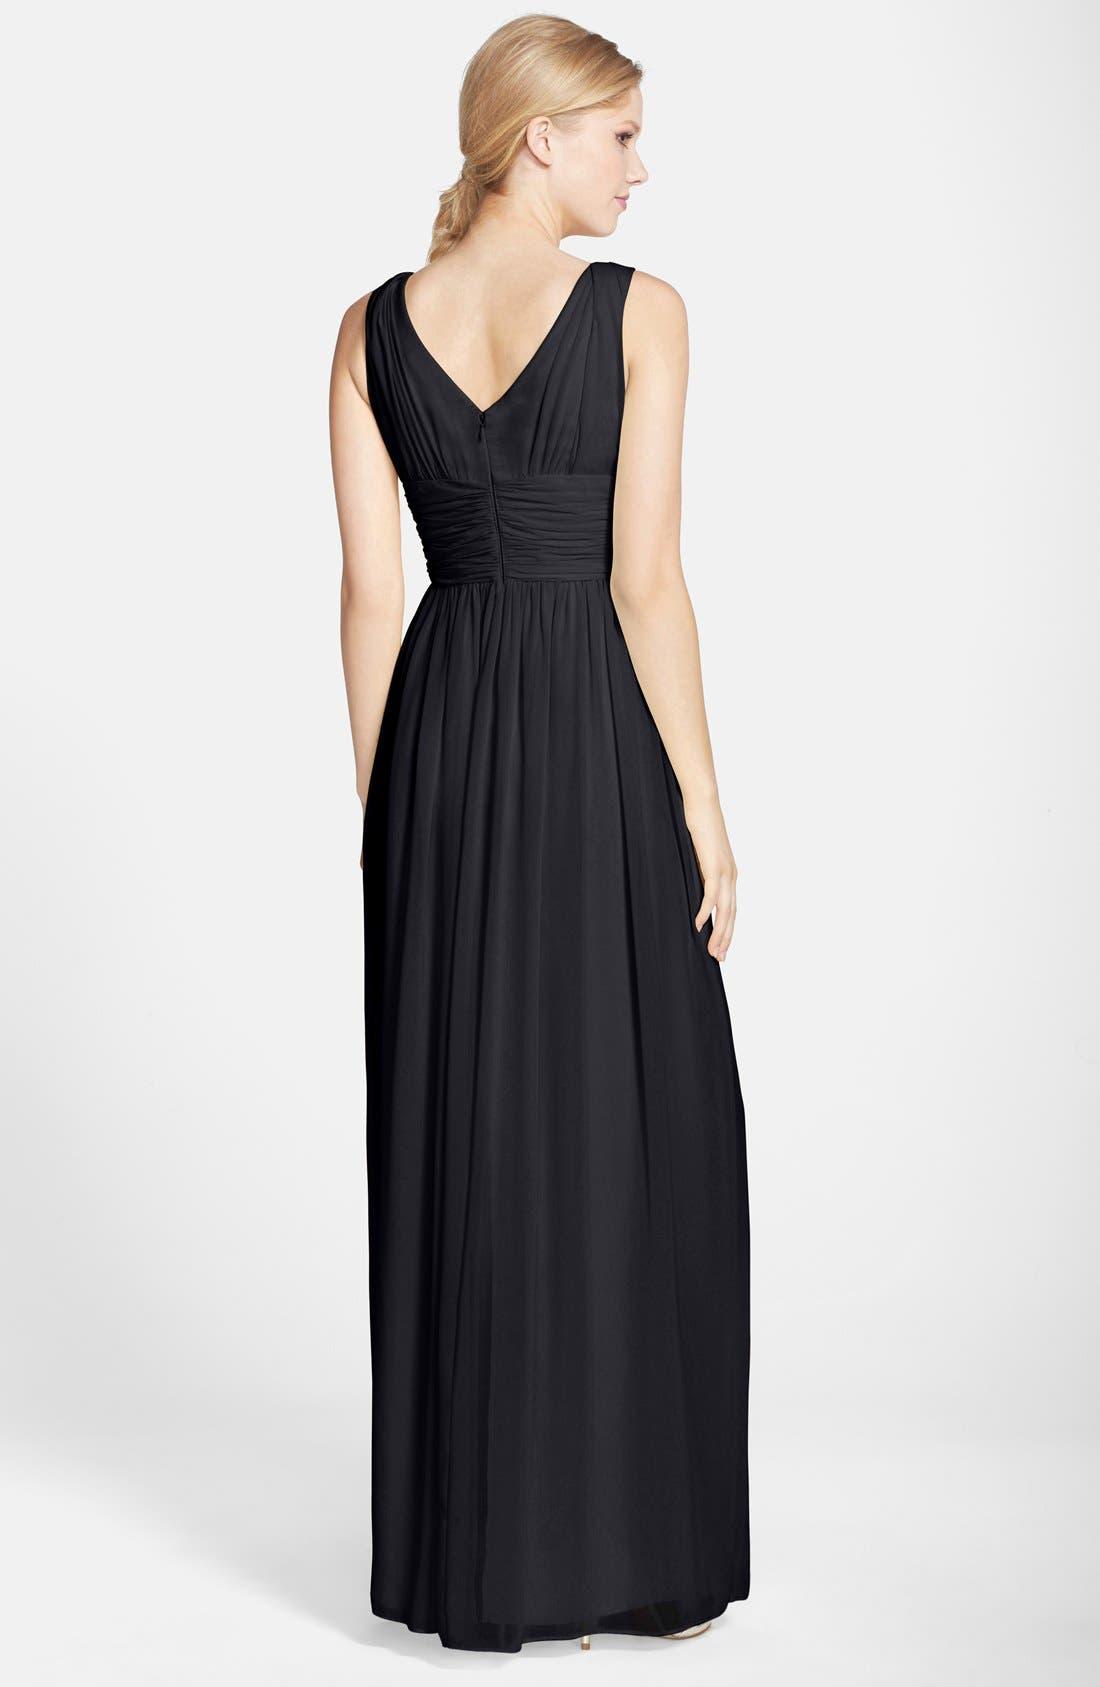 DONNA MORGAN,                             'Julie' Twist-Waist Silk Chiffon Gown,                             Alternate thumbnail 2, color,                             001